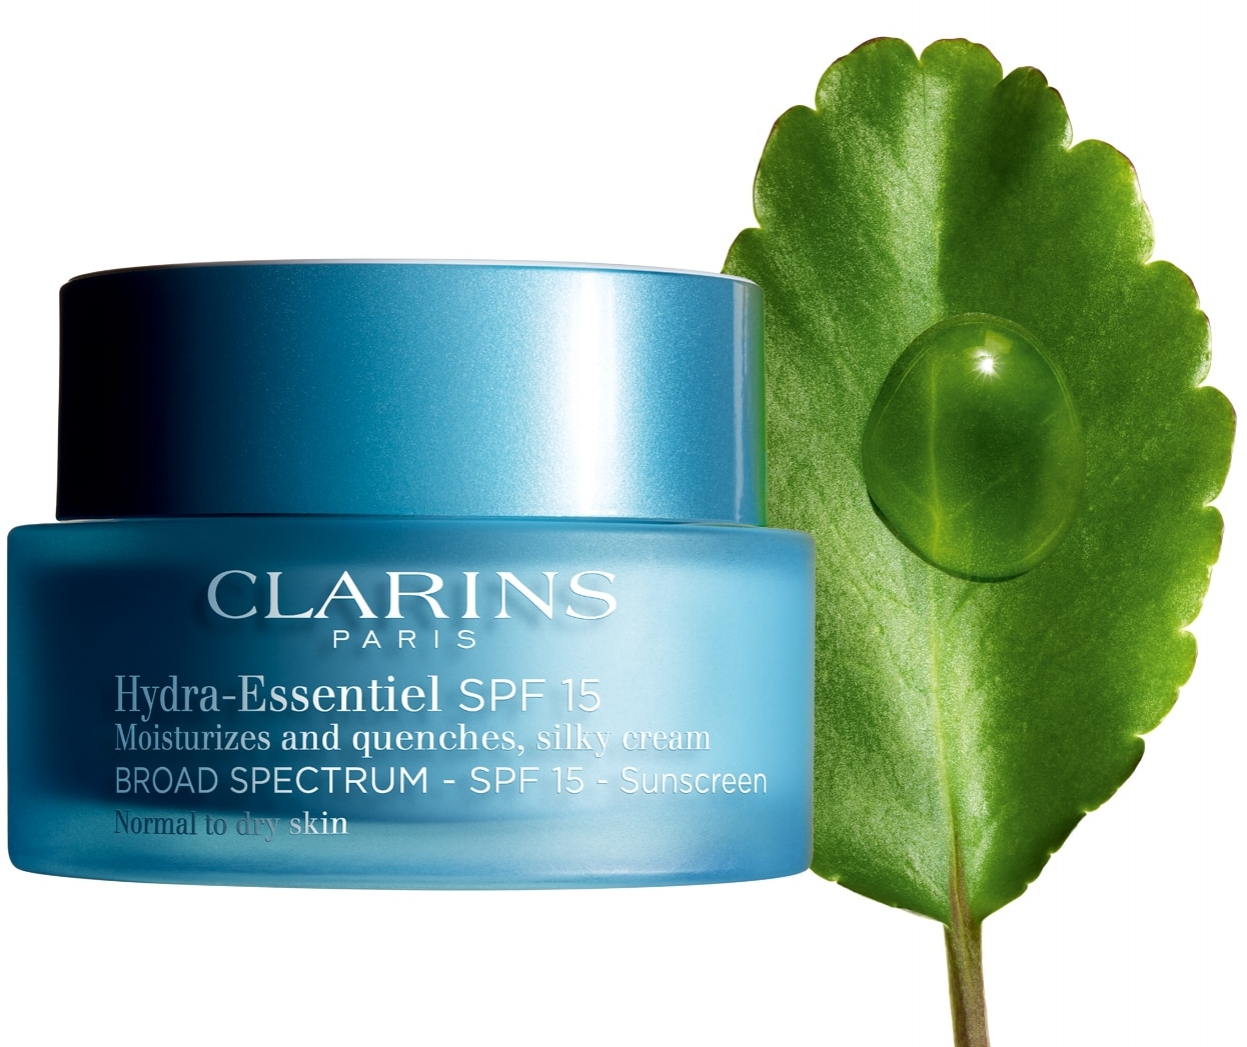 Hydra-Essentiel SPF15 Crème Désaltérante clarins